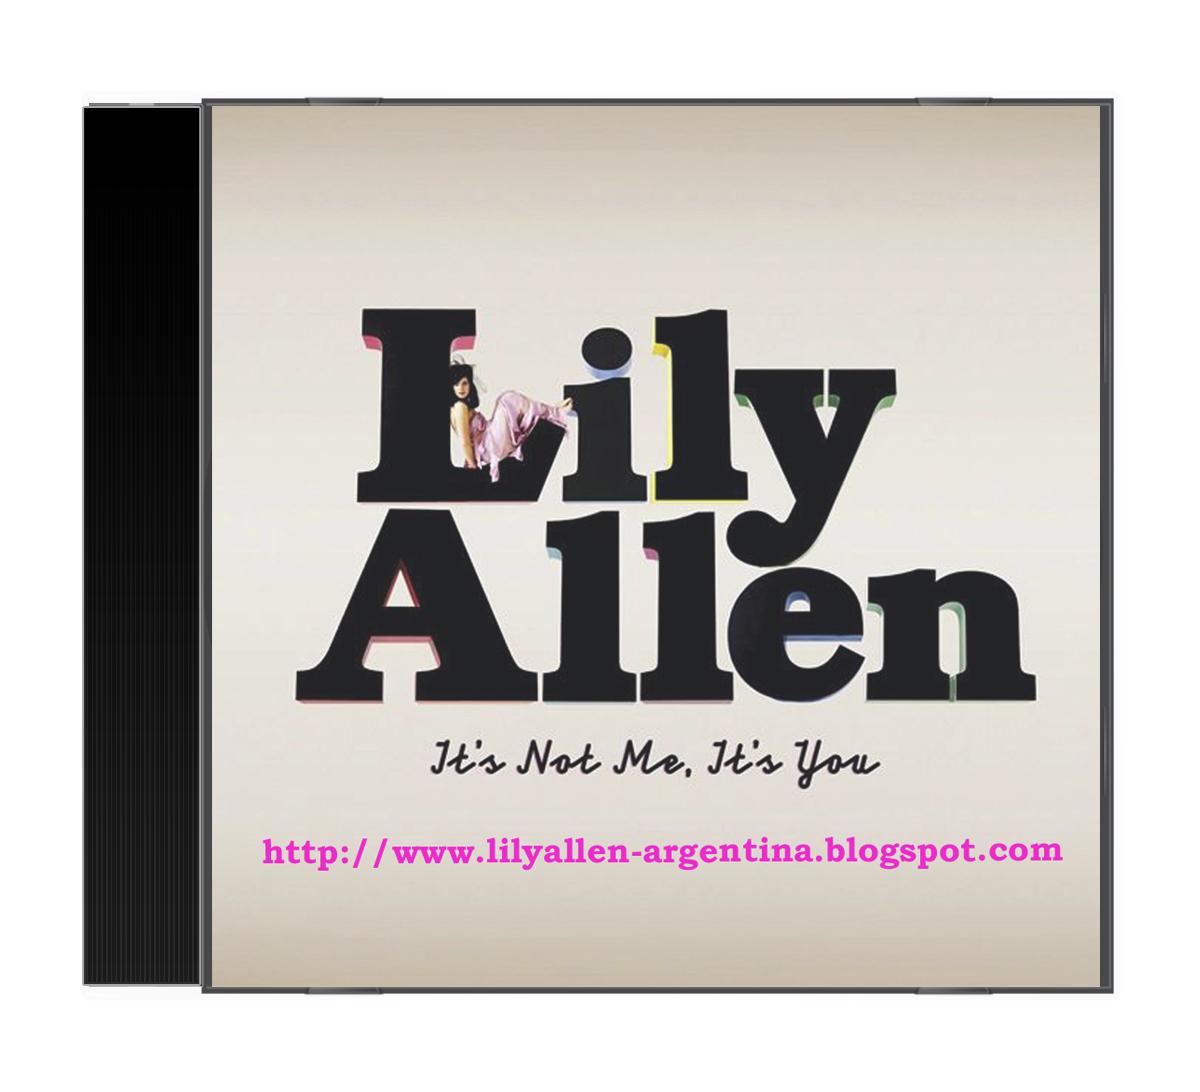 http://4.bp.blogspot.com/-wTzIw4vC24I/Tnq3DS8sa5I/AAAAAAAAAHg/YWUKEy5E54I/s1600/Tapa+Lily+ITUNES.jpg